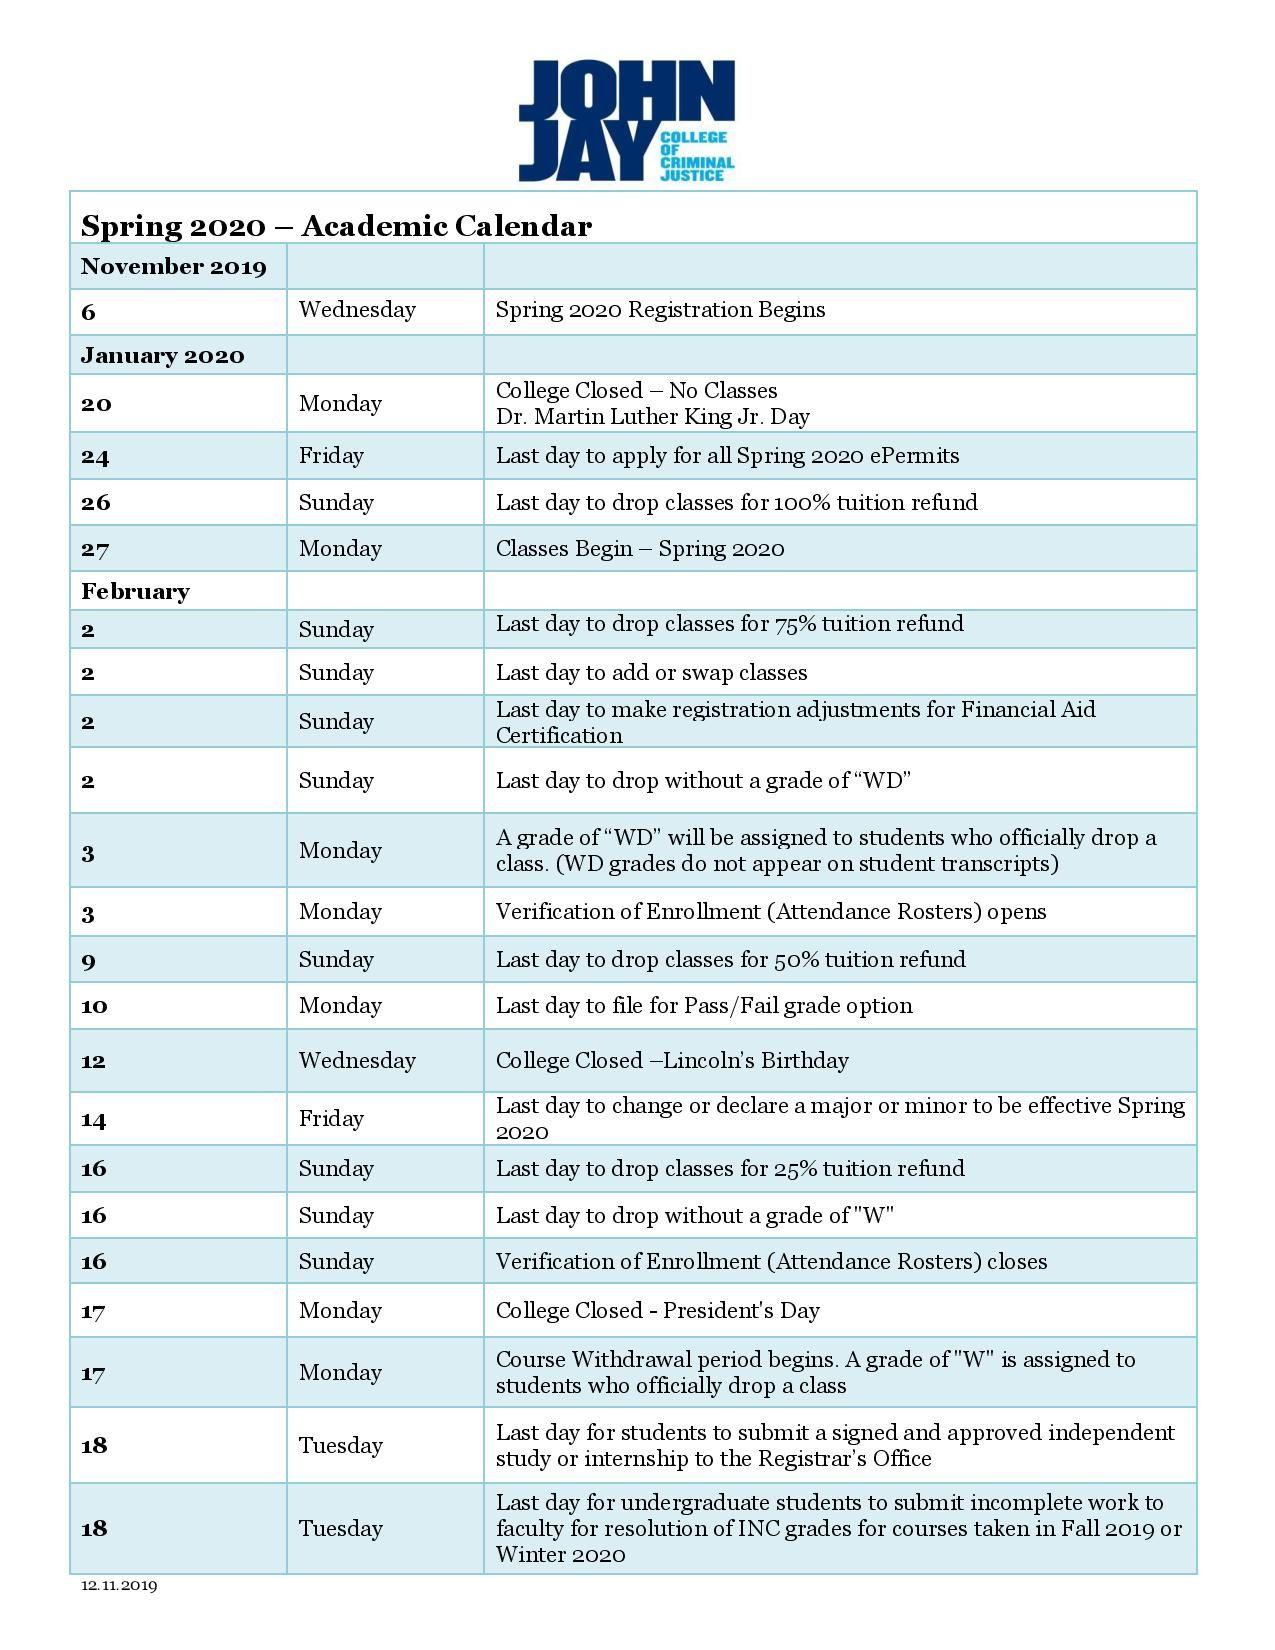 Ualbany Calendar Spring 2022.John Jay Academic Calendar Spring 2020 Https Www Youcalendars Com John Jay Academic Calendar Html Academic Calendar Academics Calendar